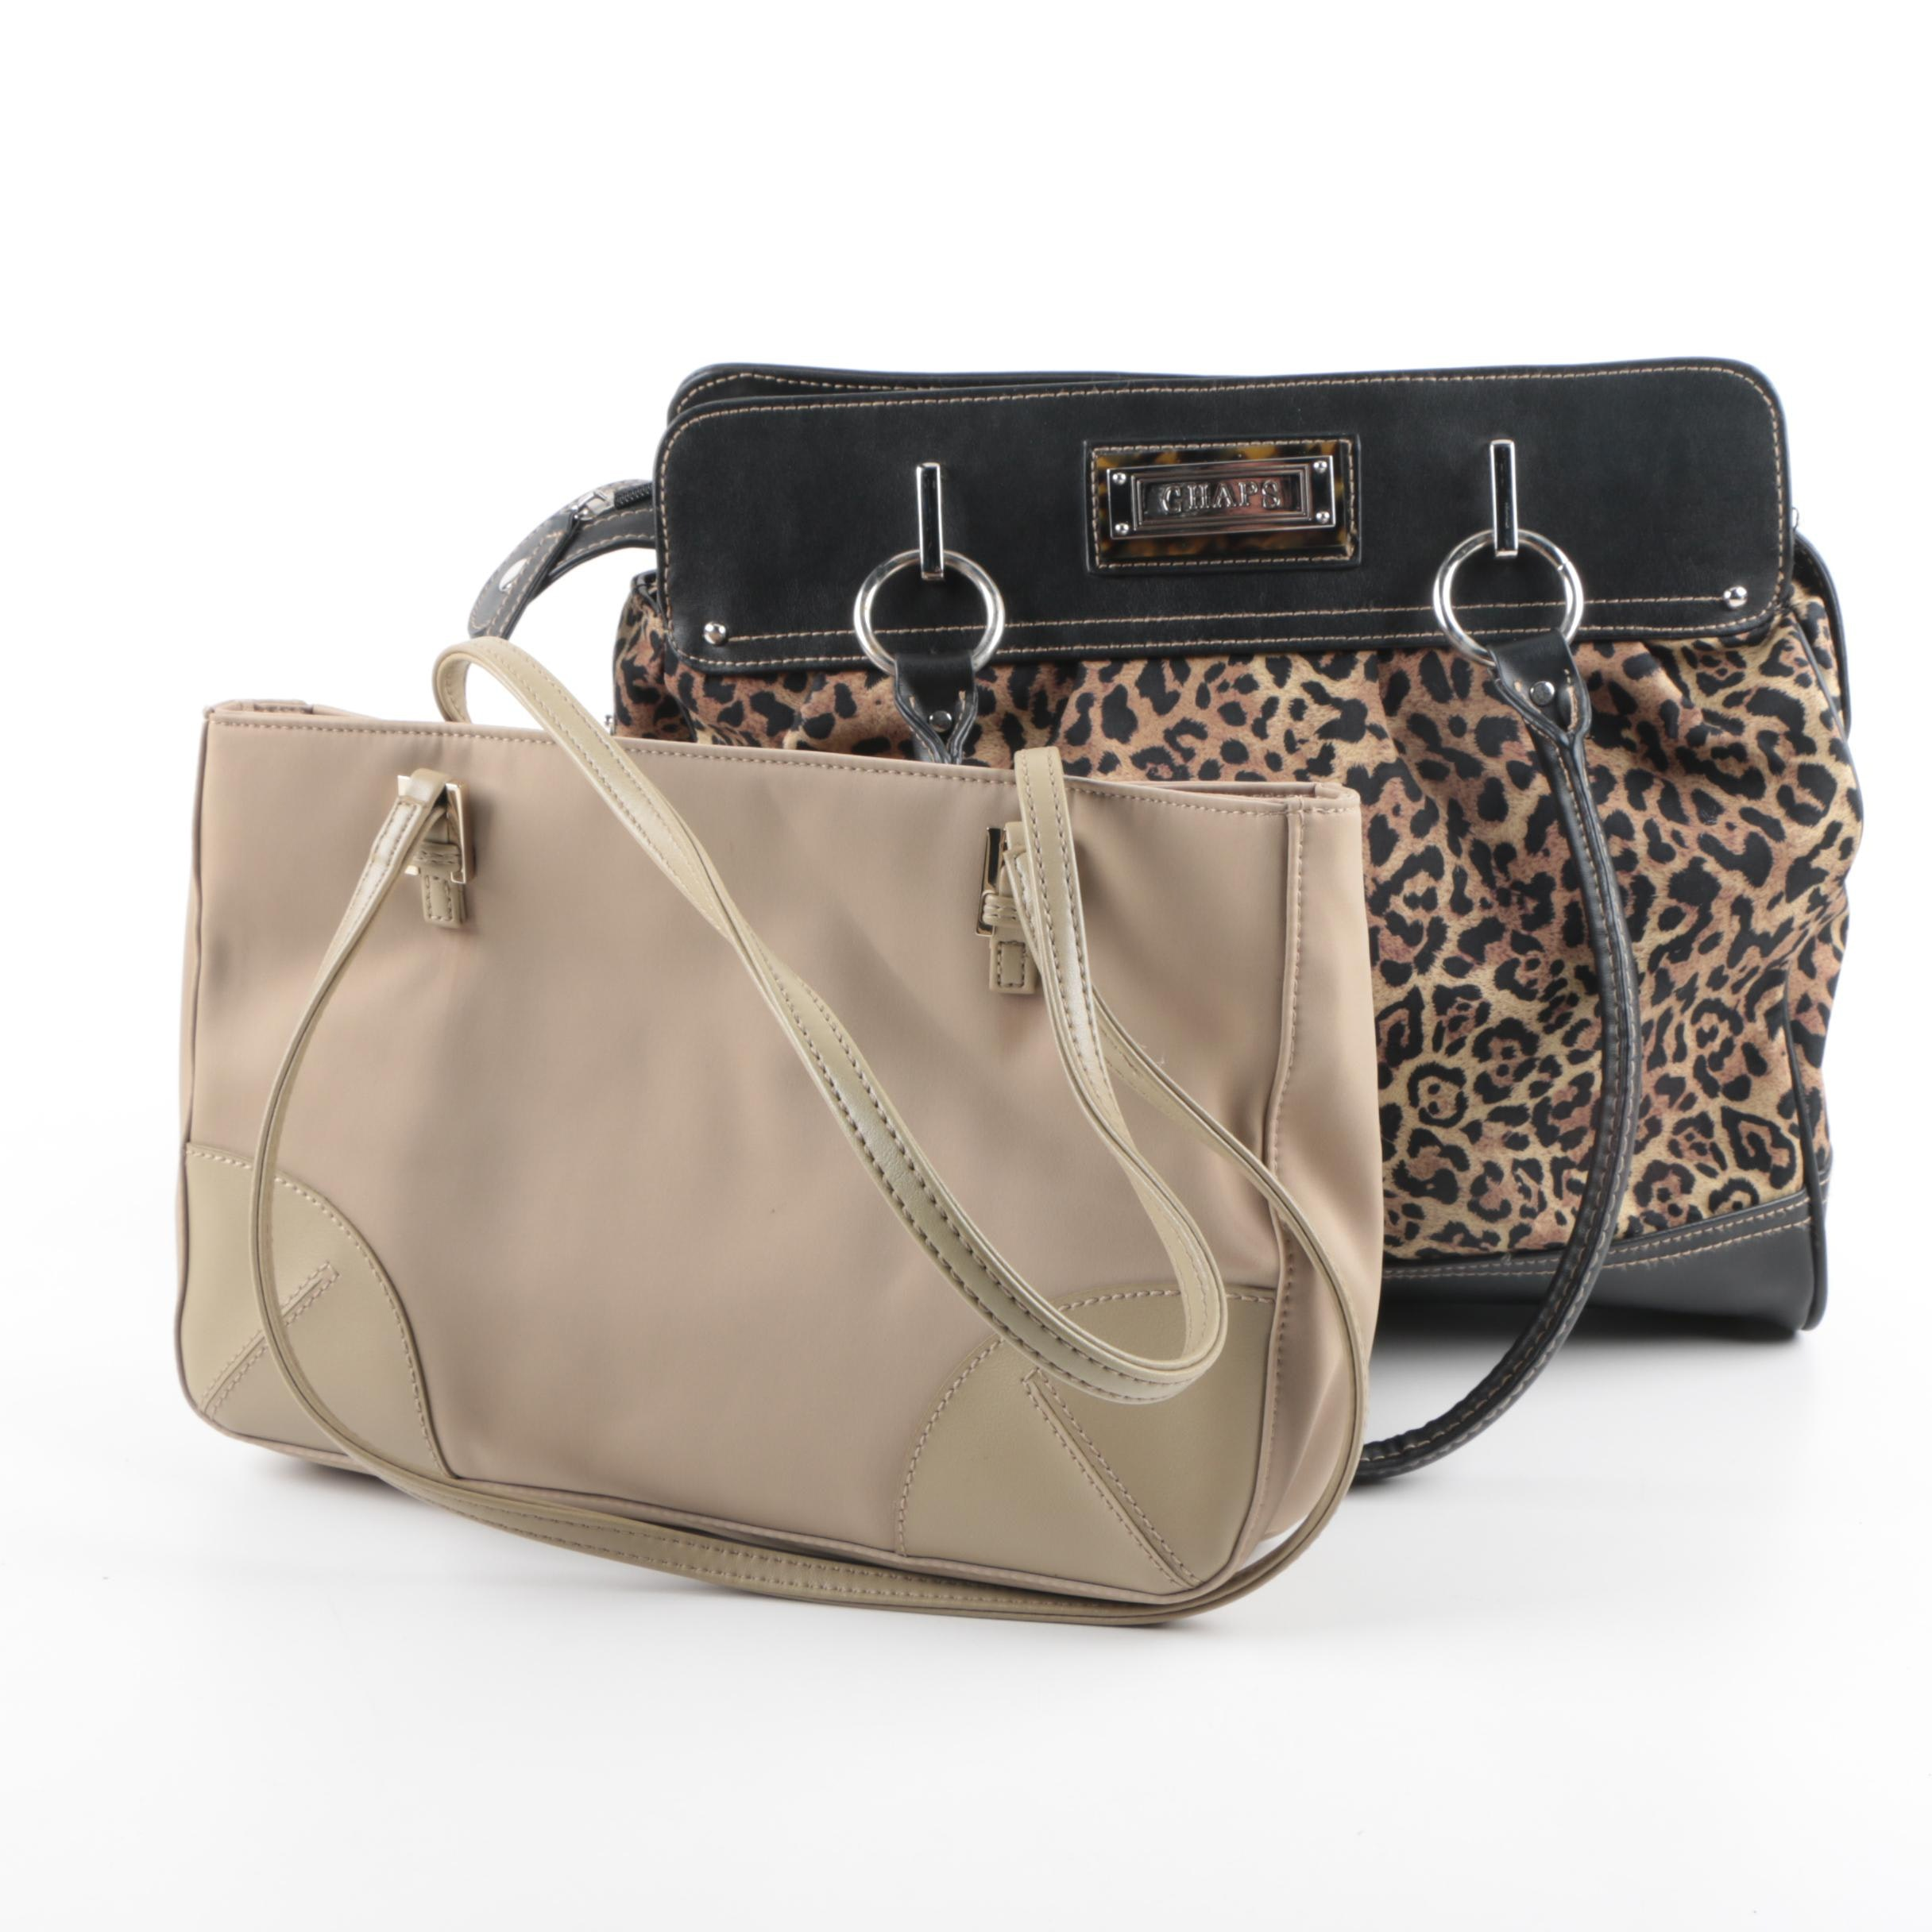 Ralph Lauren Chaps and Liz Claiborne Handbags